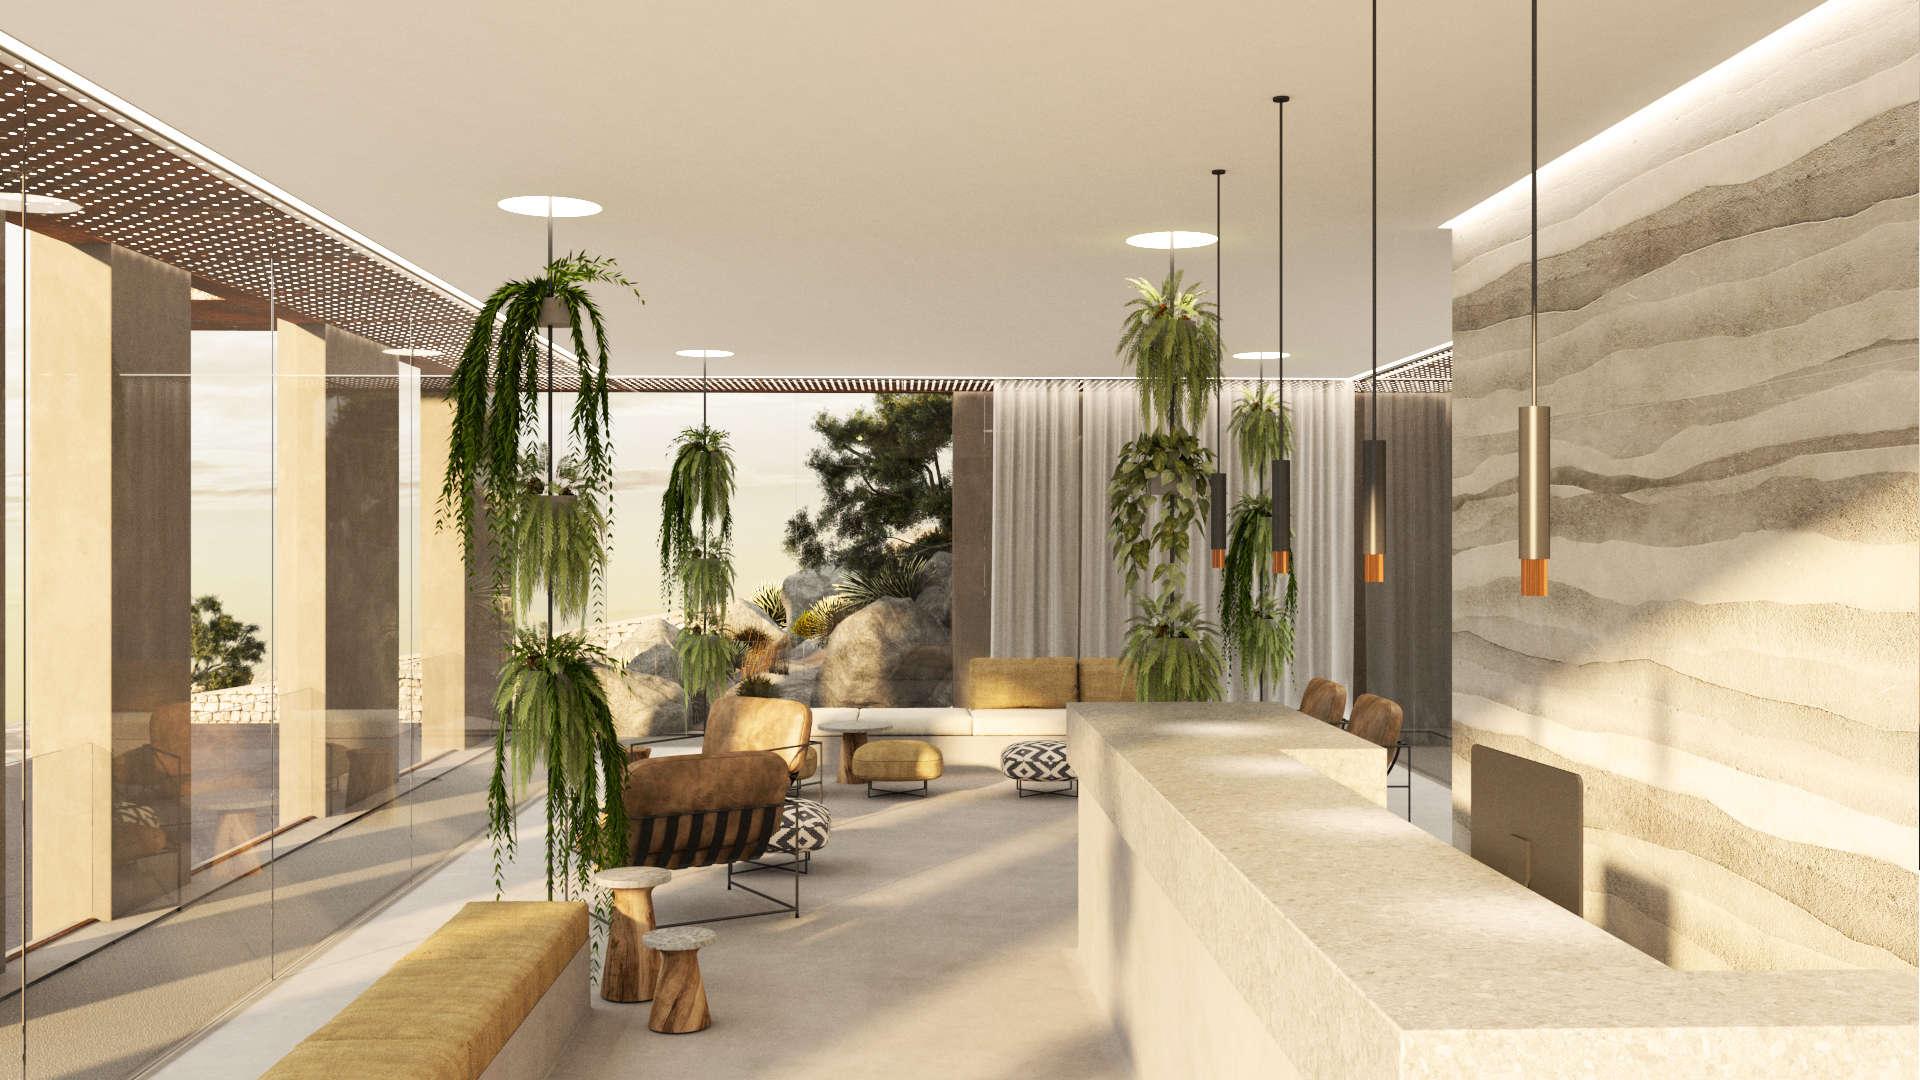 Reception and lobby interior design, rammed earth wall. Εσωτερικός χώρος της Ρεσεψιόν και της αίθουσας αναμονής. Τοίχος με την τεχνική του rammed earth.